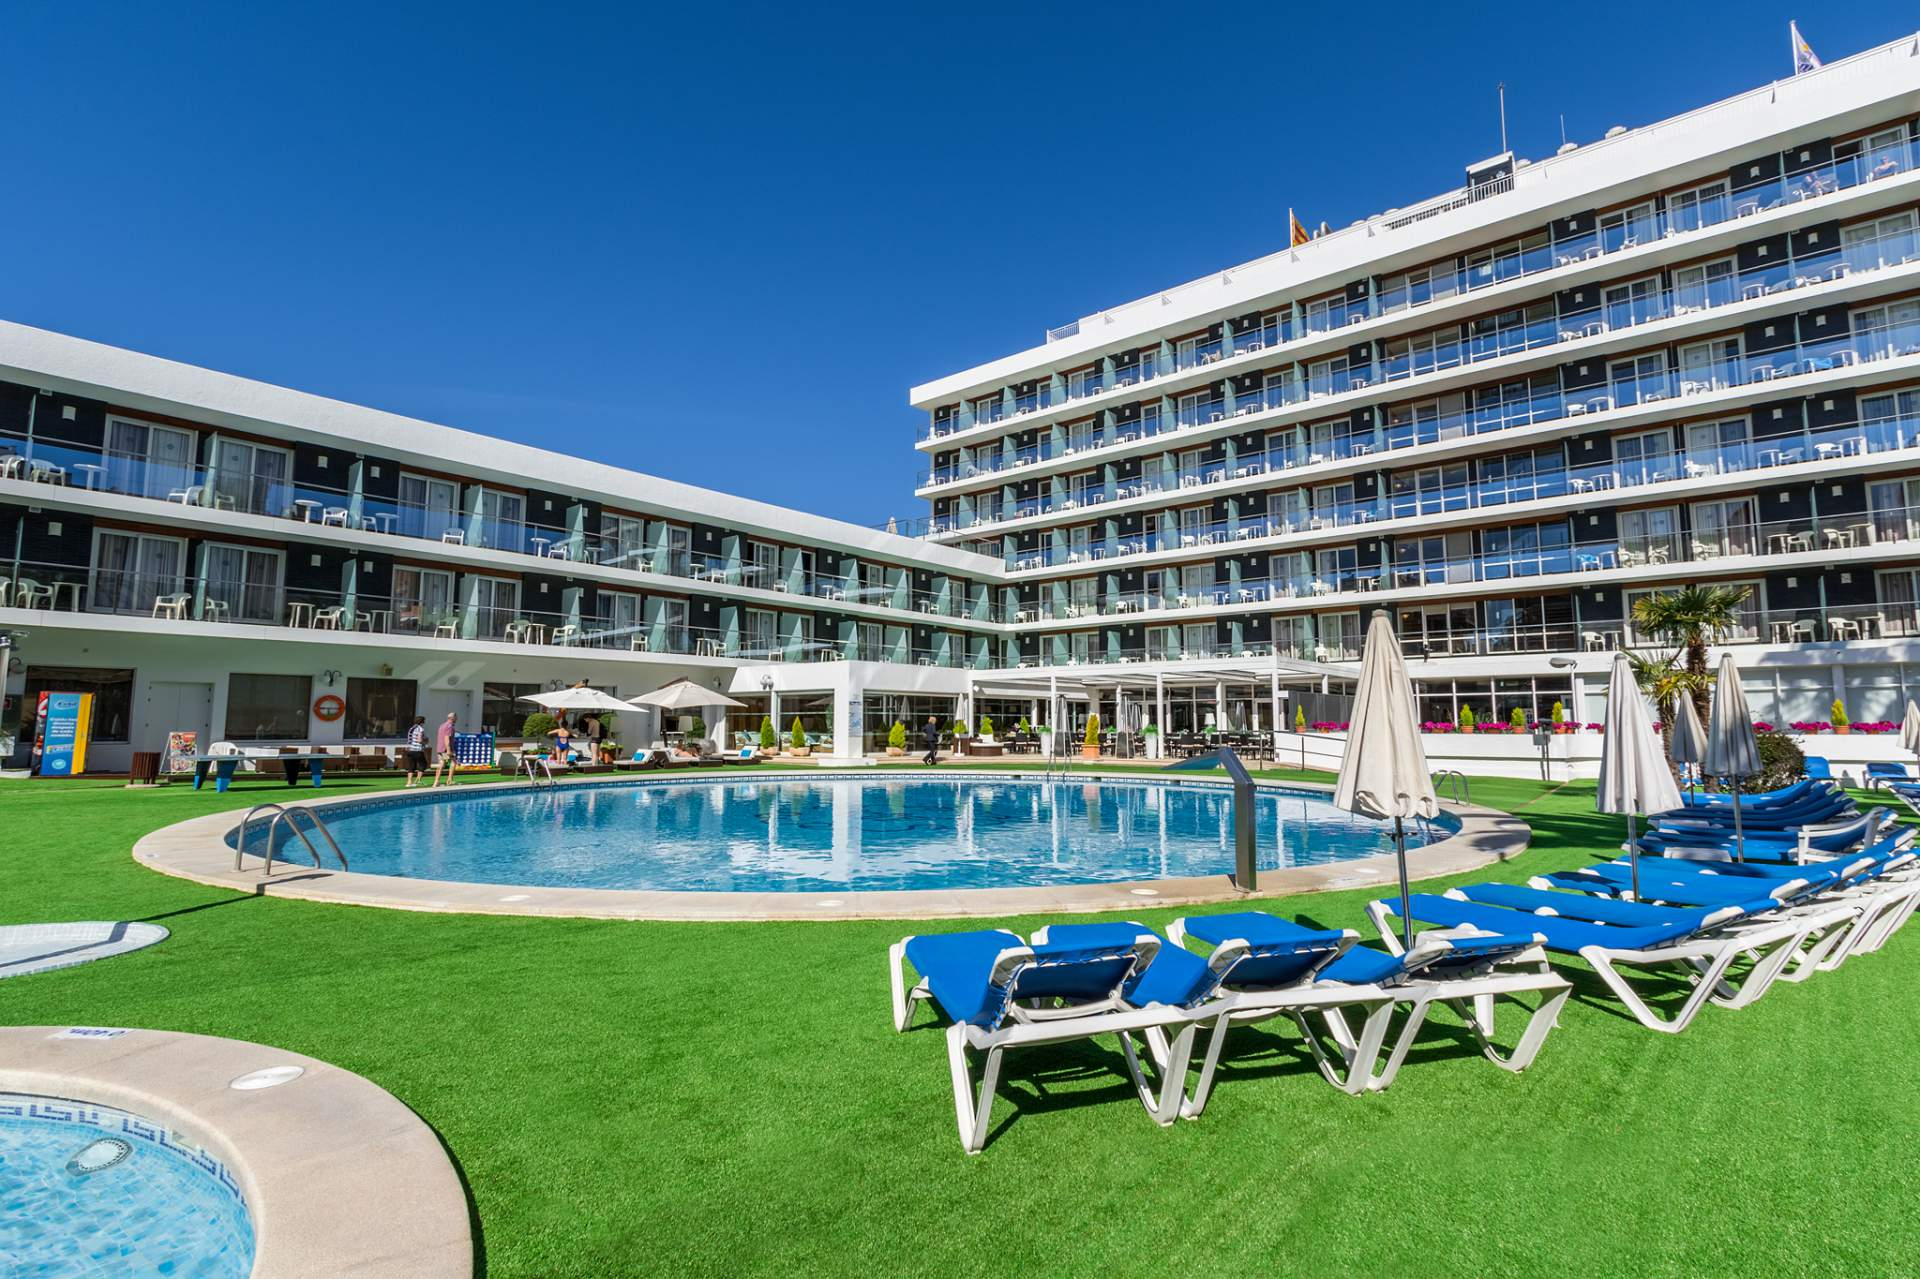 Busreis Lloret de Mar Promo Hotel Anabel strandvakantie